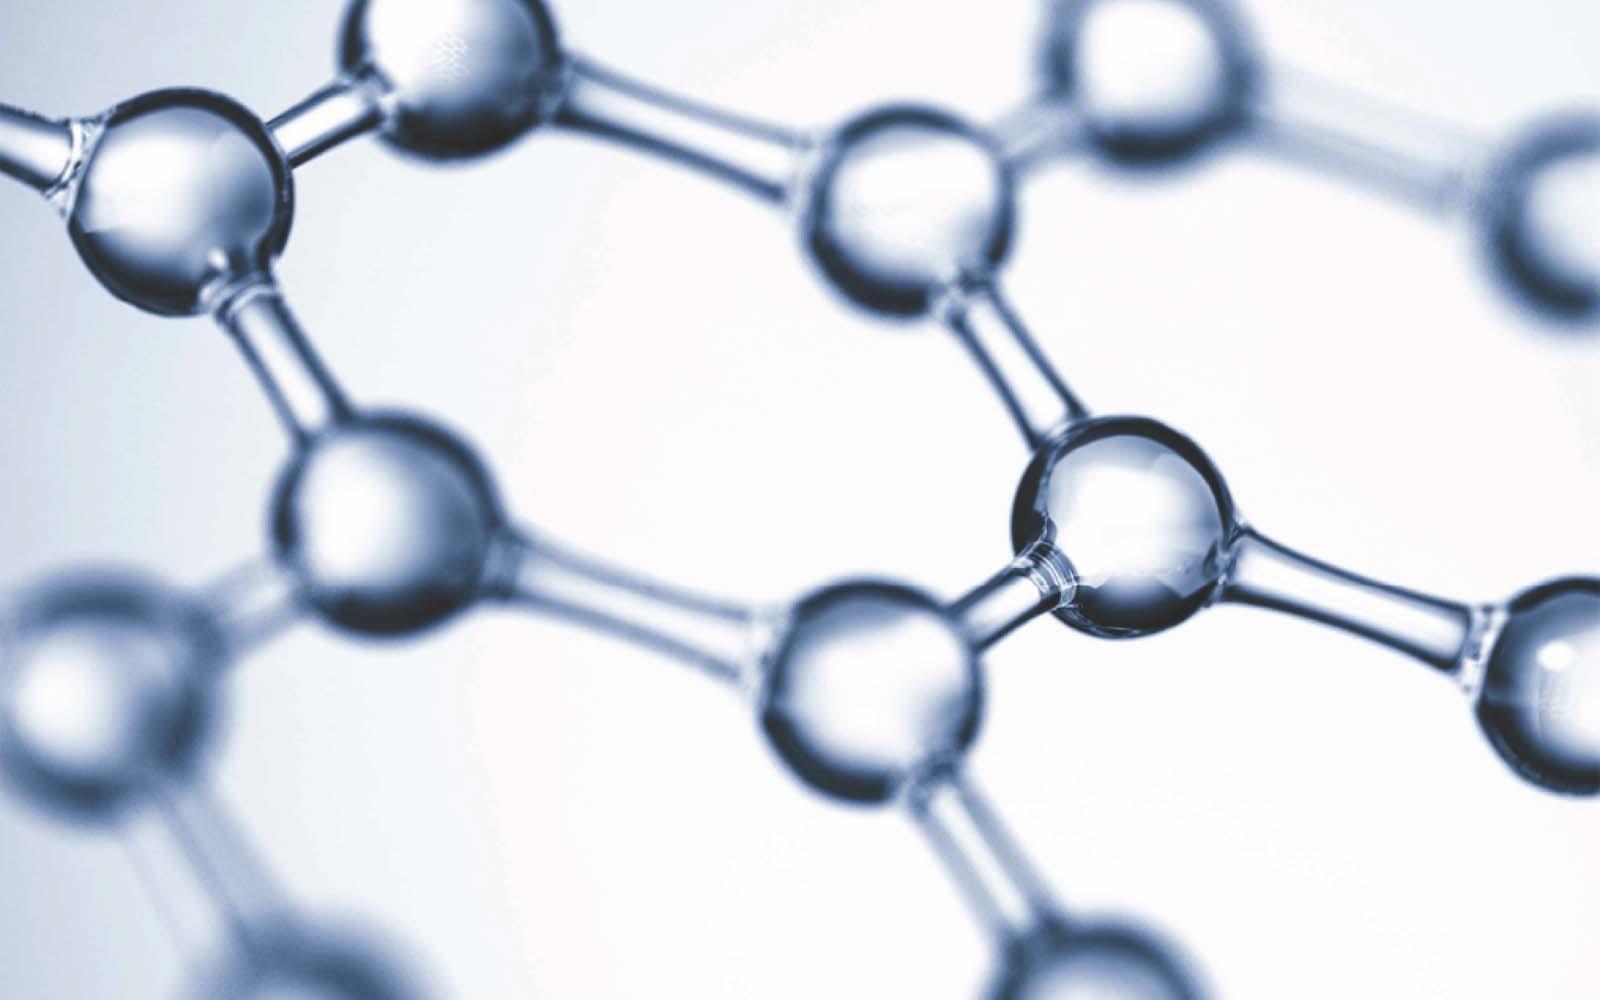 Nanoscience Research: Microscopy & Microanalysis